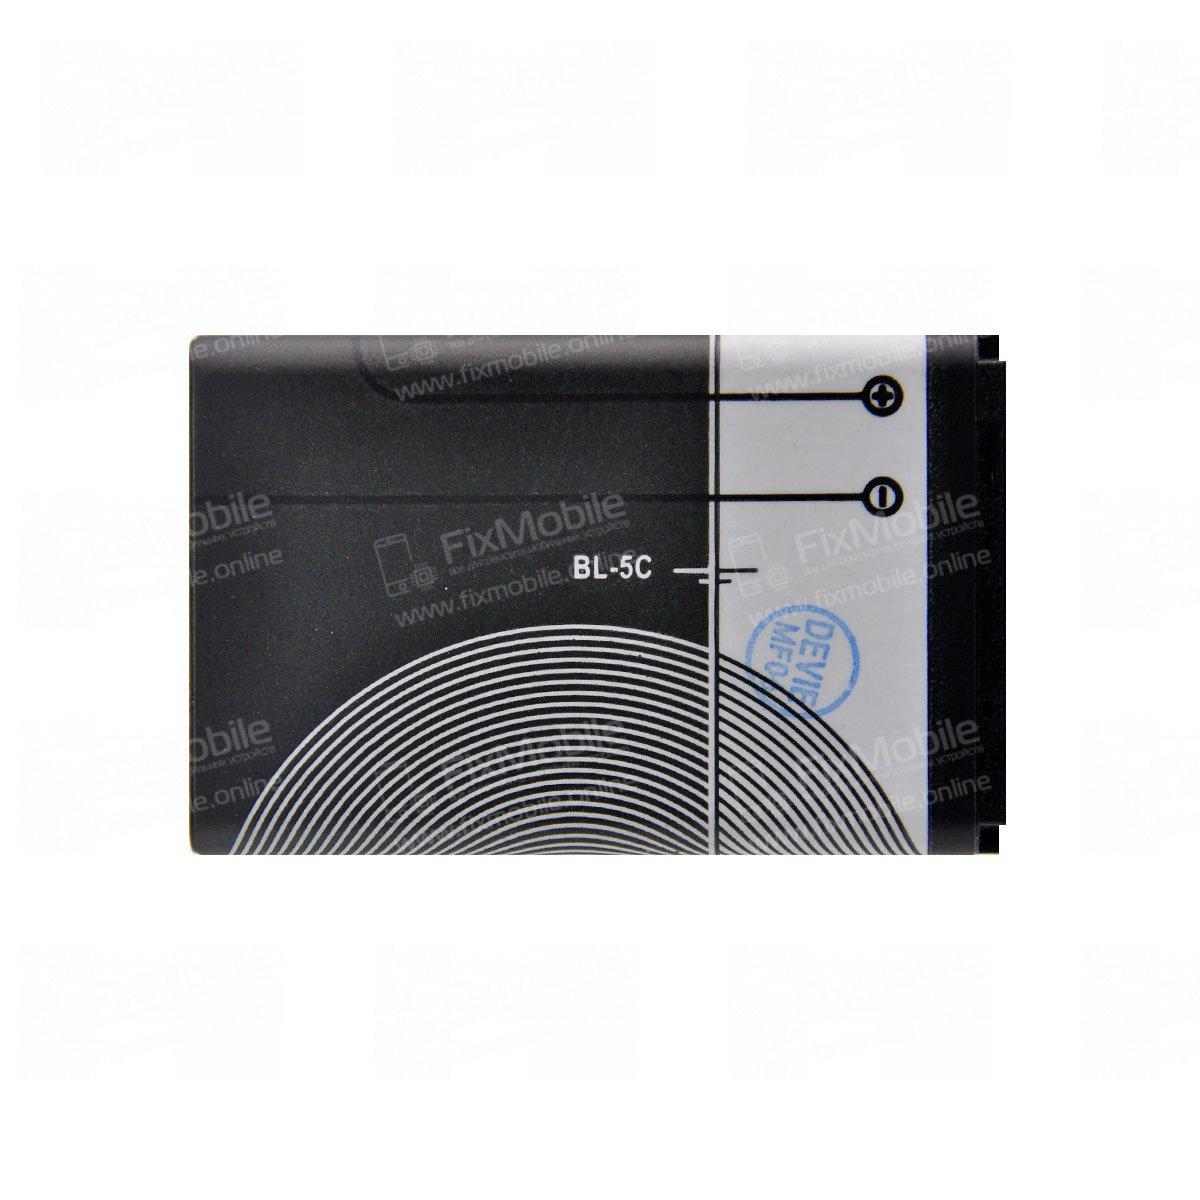 Аккумуляторная батарея для Nokia 205 Dual BL-5C